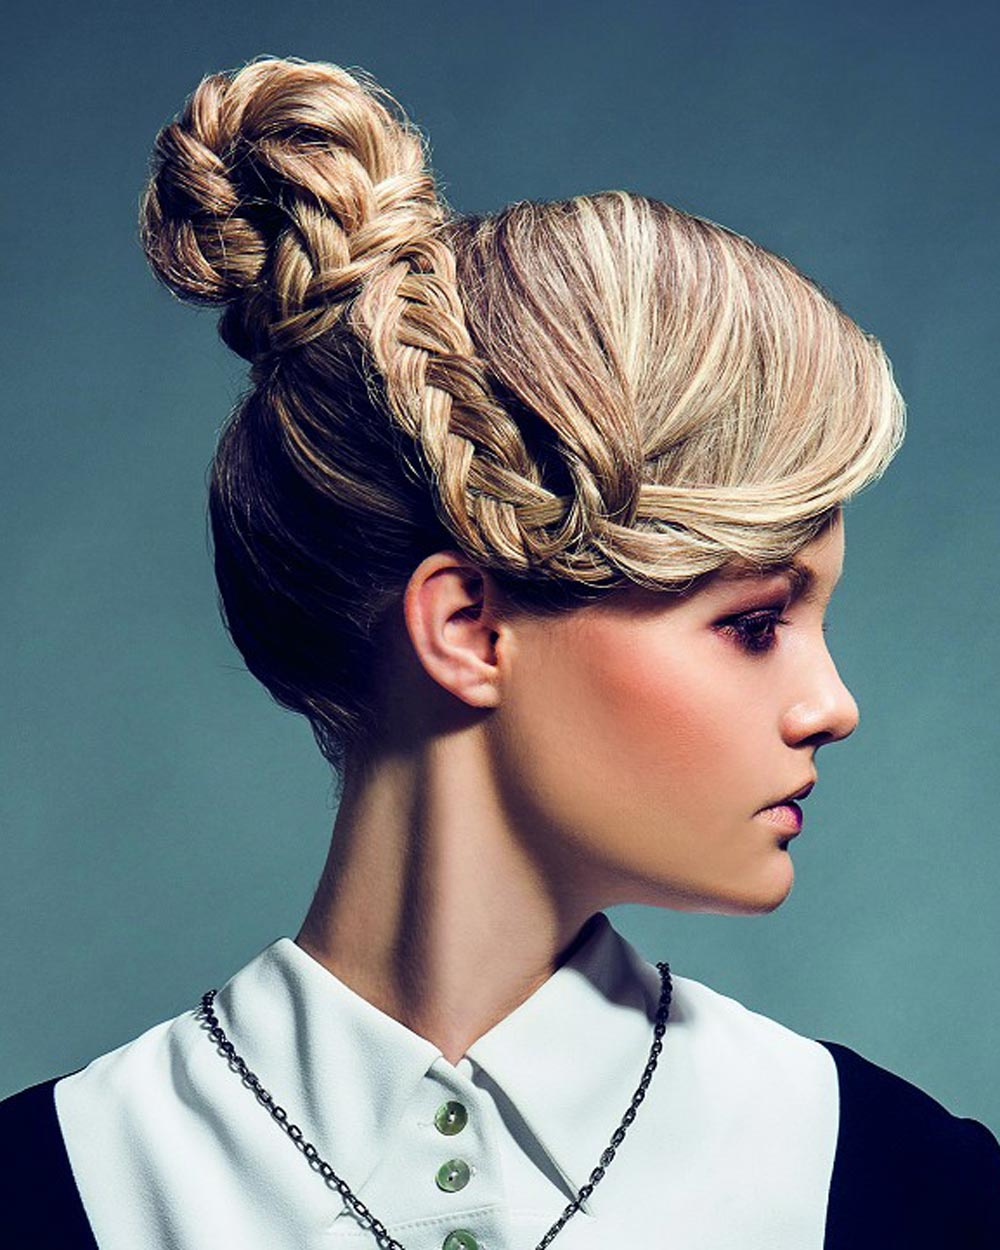 Стрижка волос 2016 модные тенденции фото